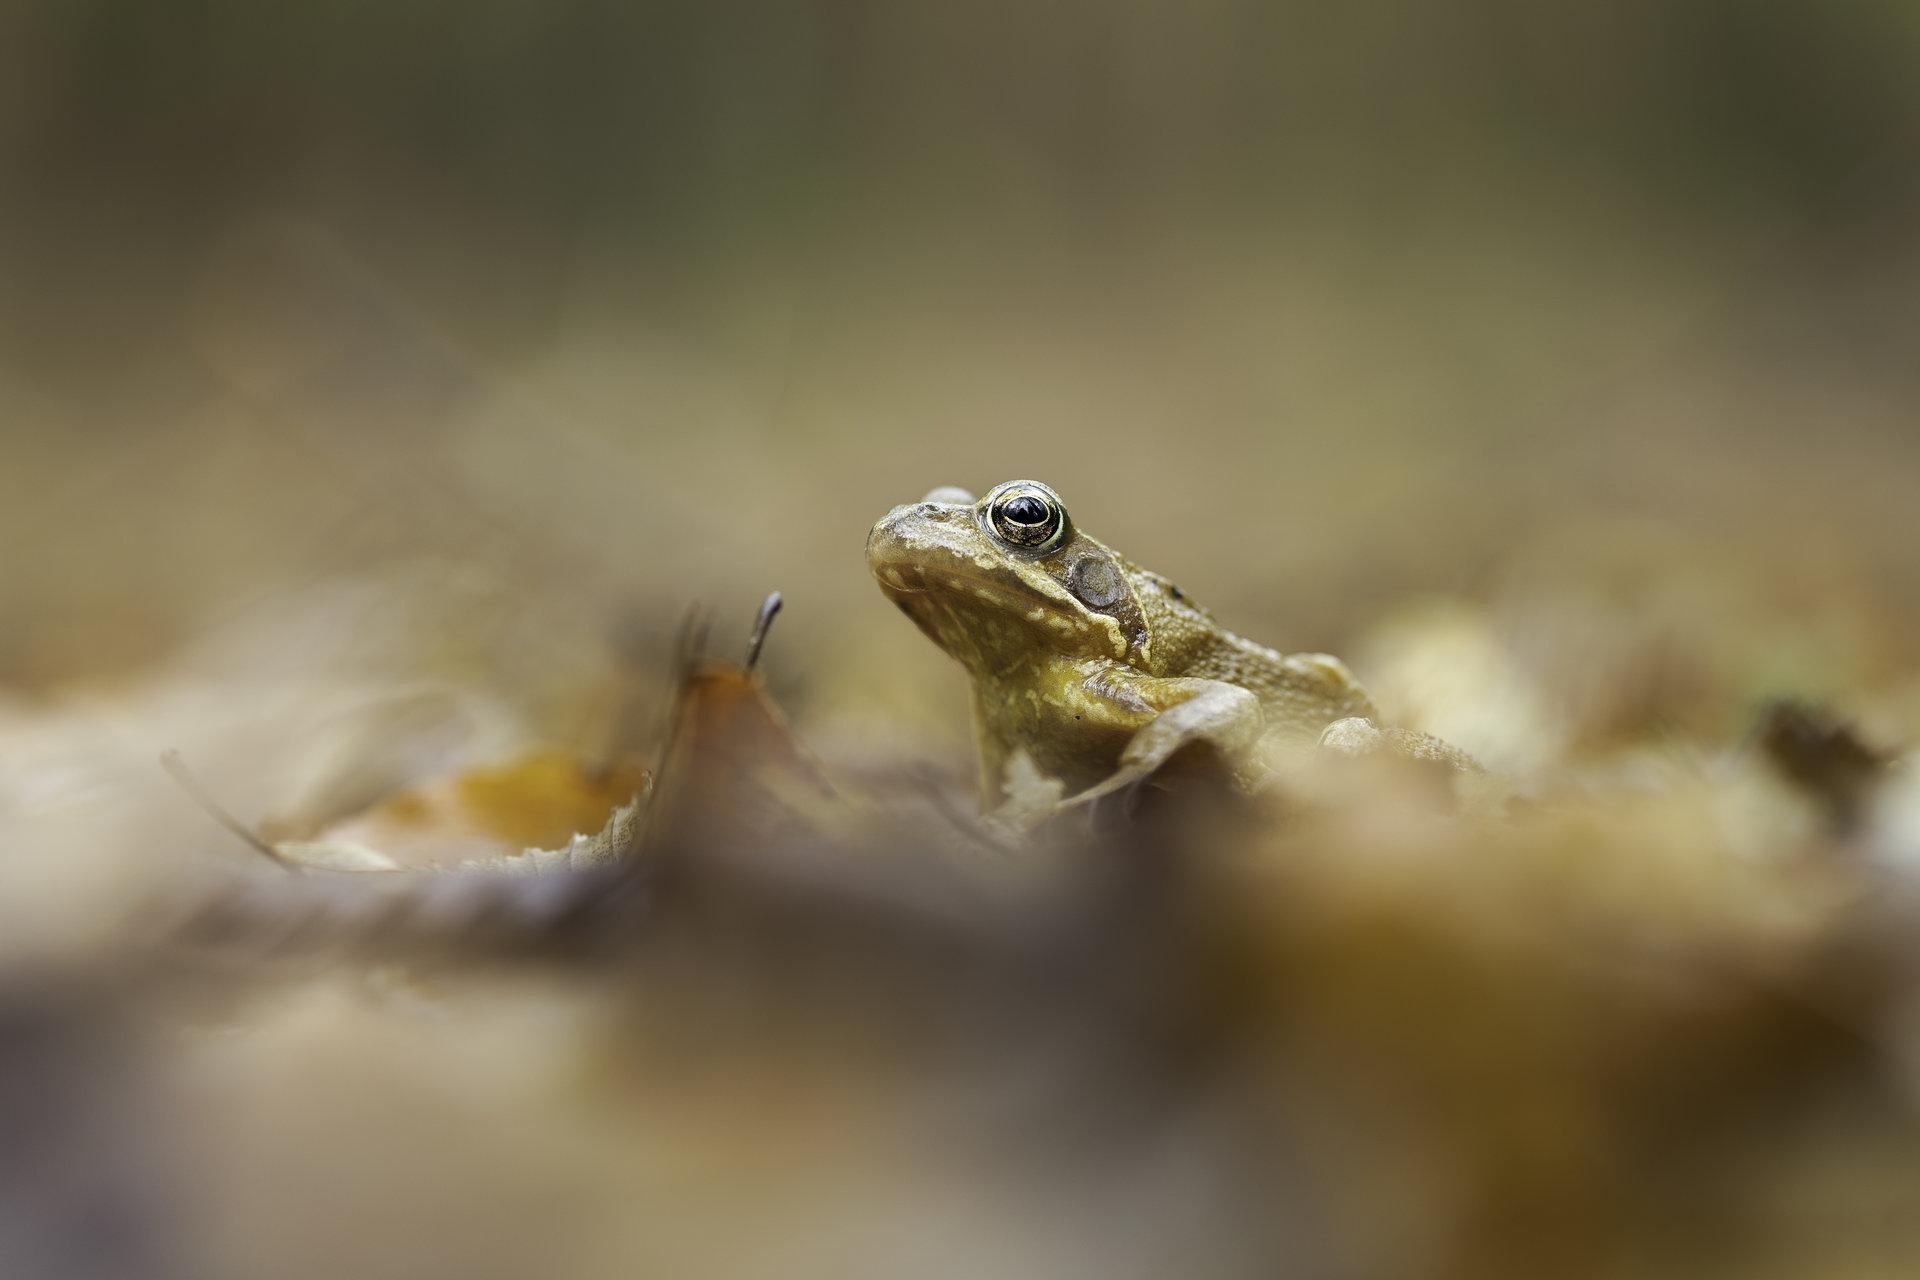 Горска дългокрака жаба (rana dalmatina)   Author Valentin Ivanov - valniuk   PHOTO FORUM